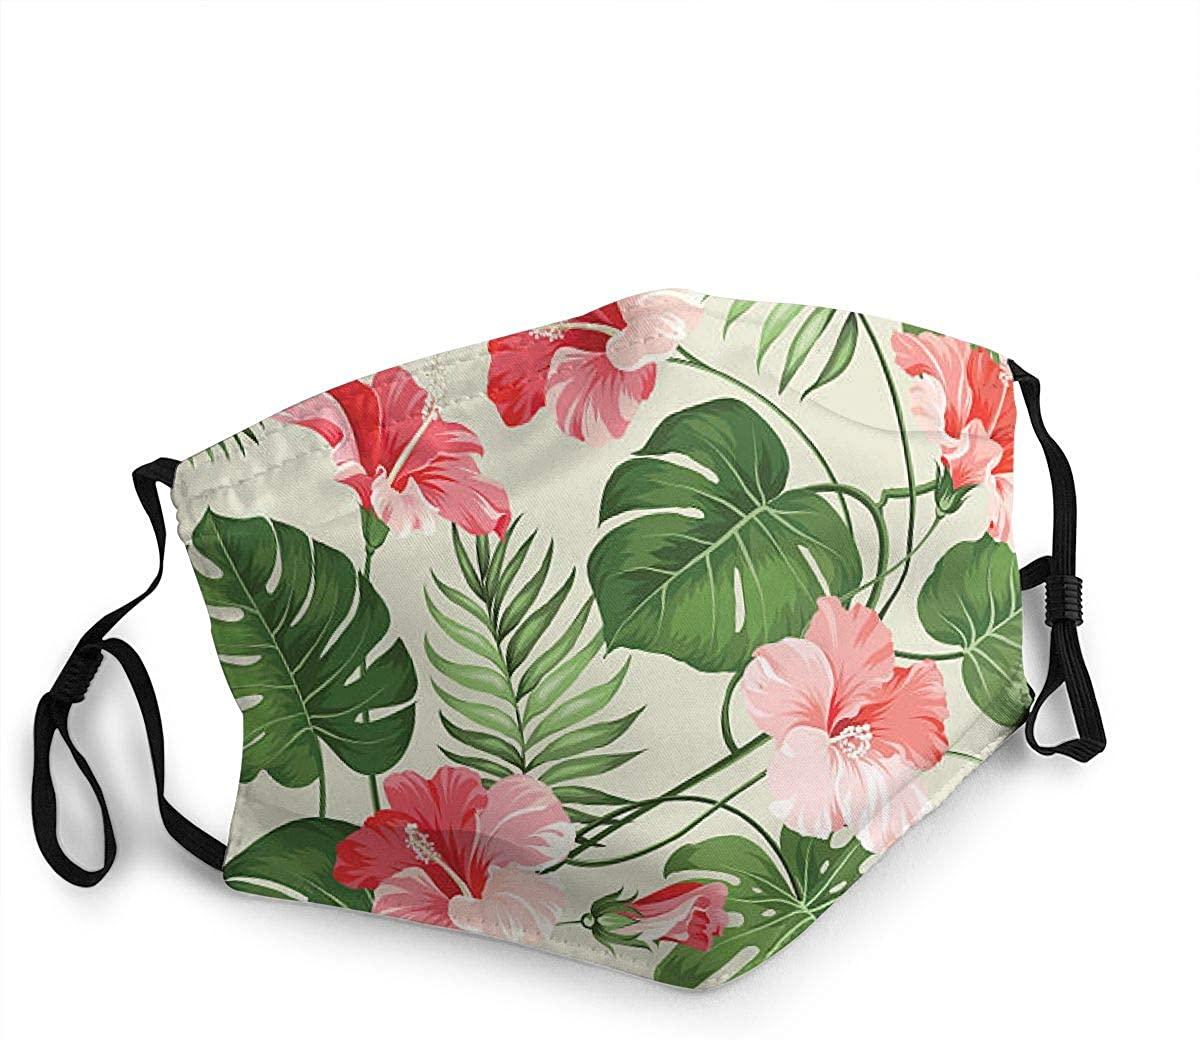 MARTHLORES Fashion Protective, Reusable Cotton Fabric Tropical Unisex Cotton, Washable,Adjustable, Reusable.